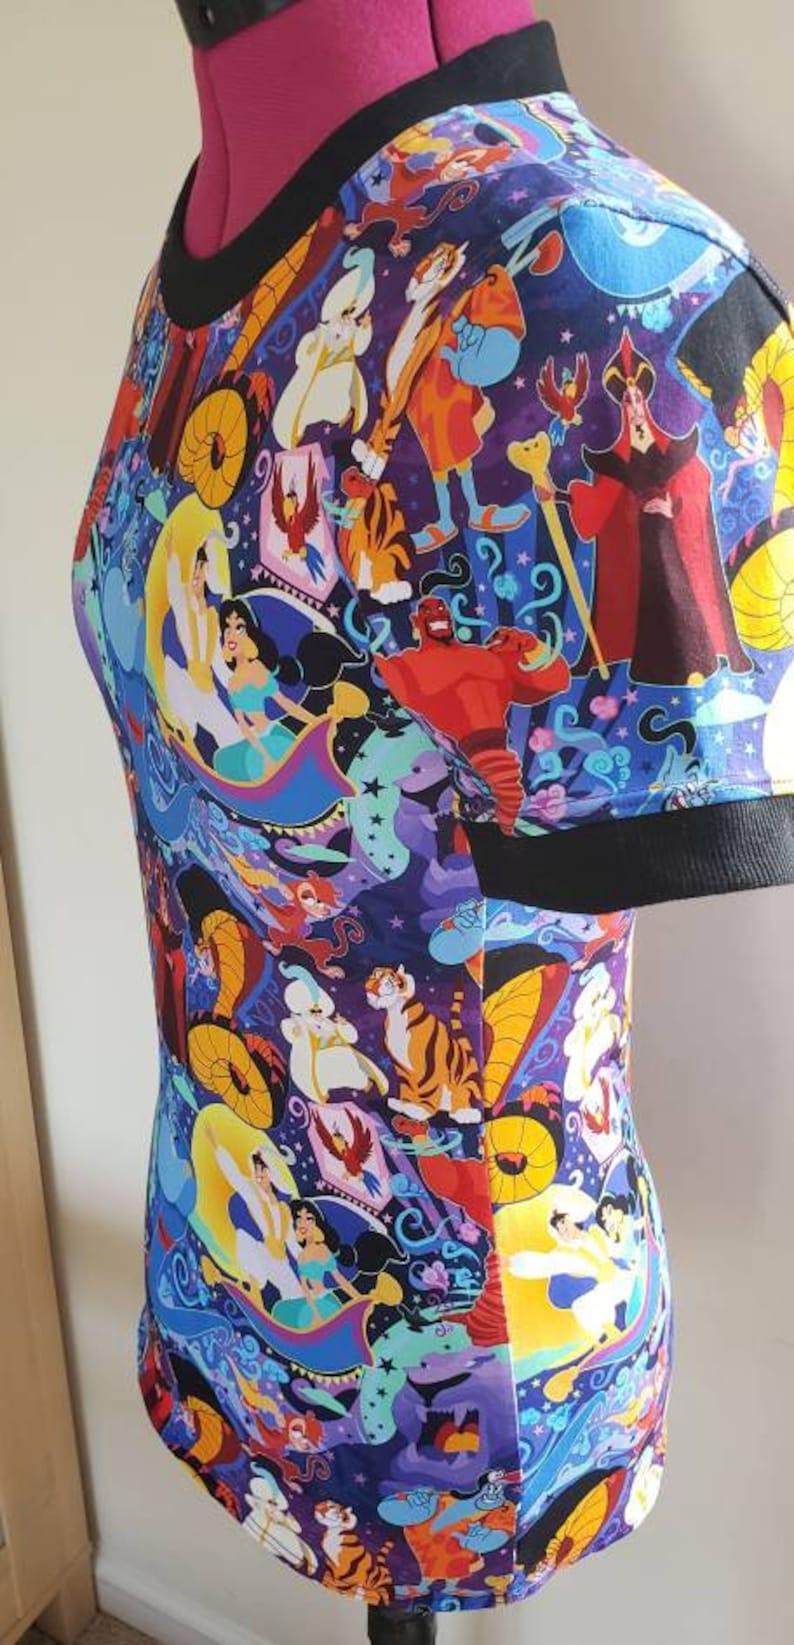 OOAK Disney Aladdin themed Ringer Tee Size Small